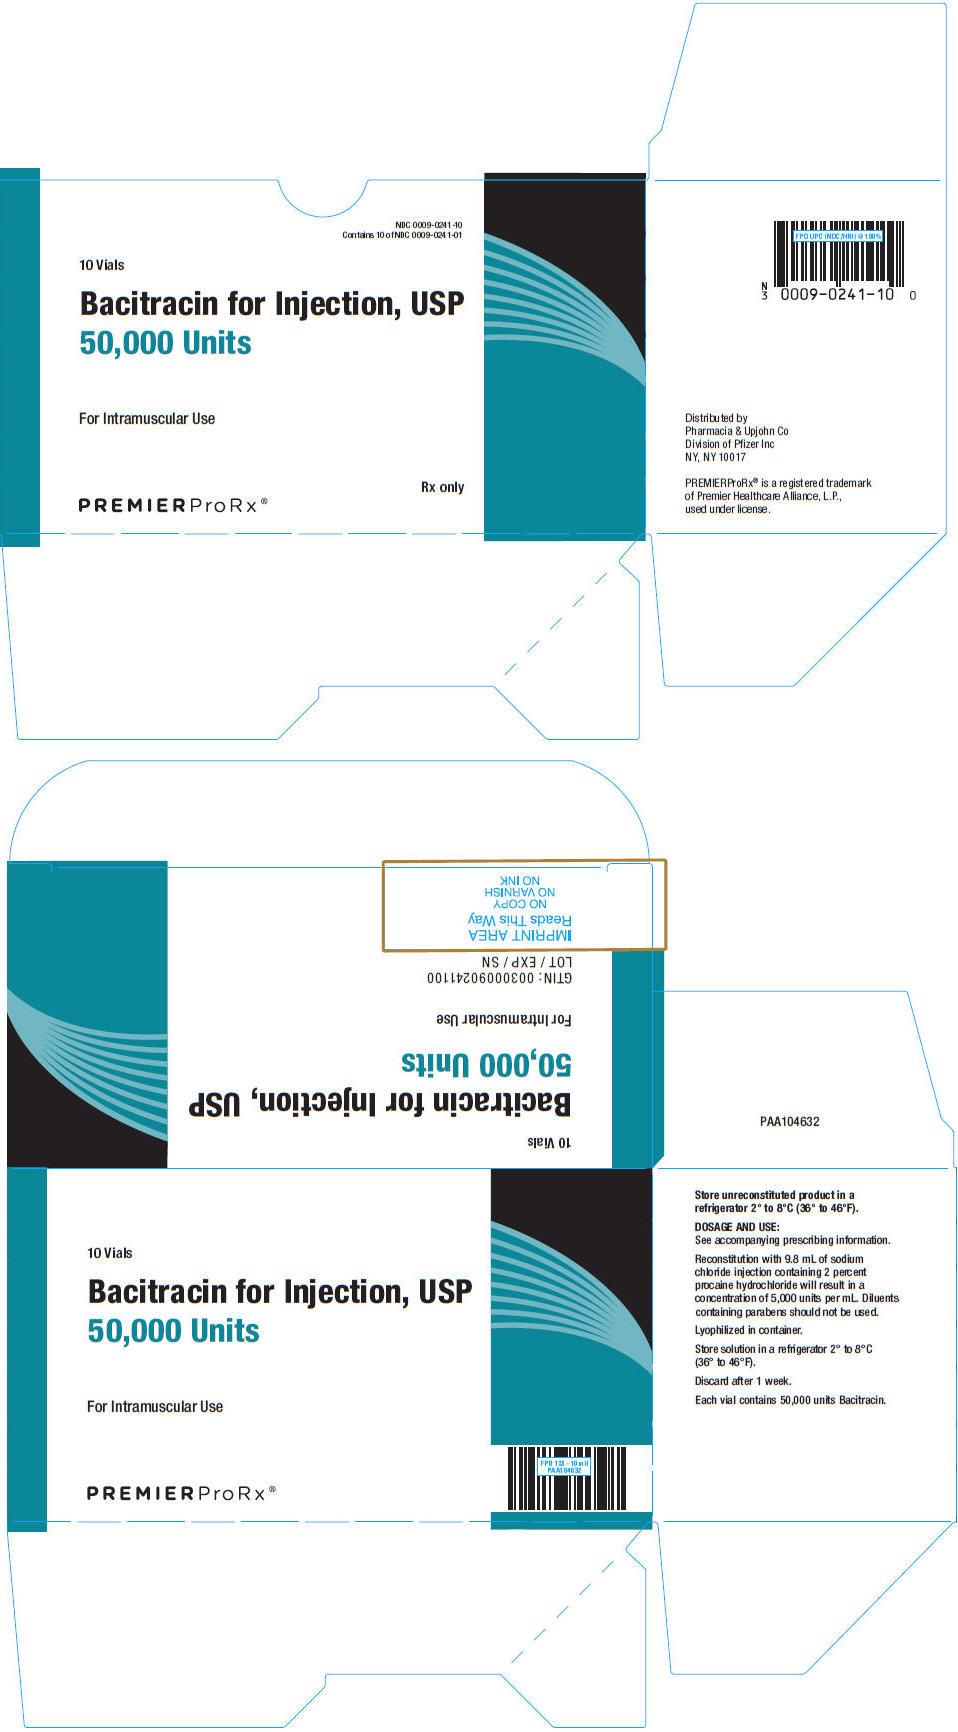 PRINCIPAL DISPLAY PANEL - 10 Vial Carton